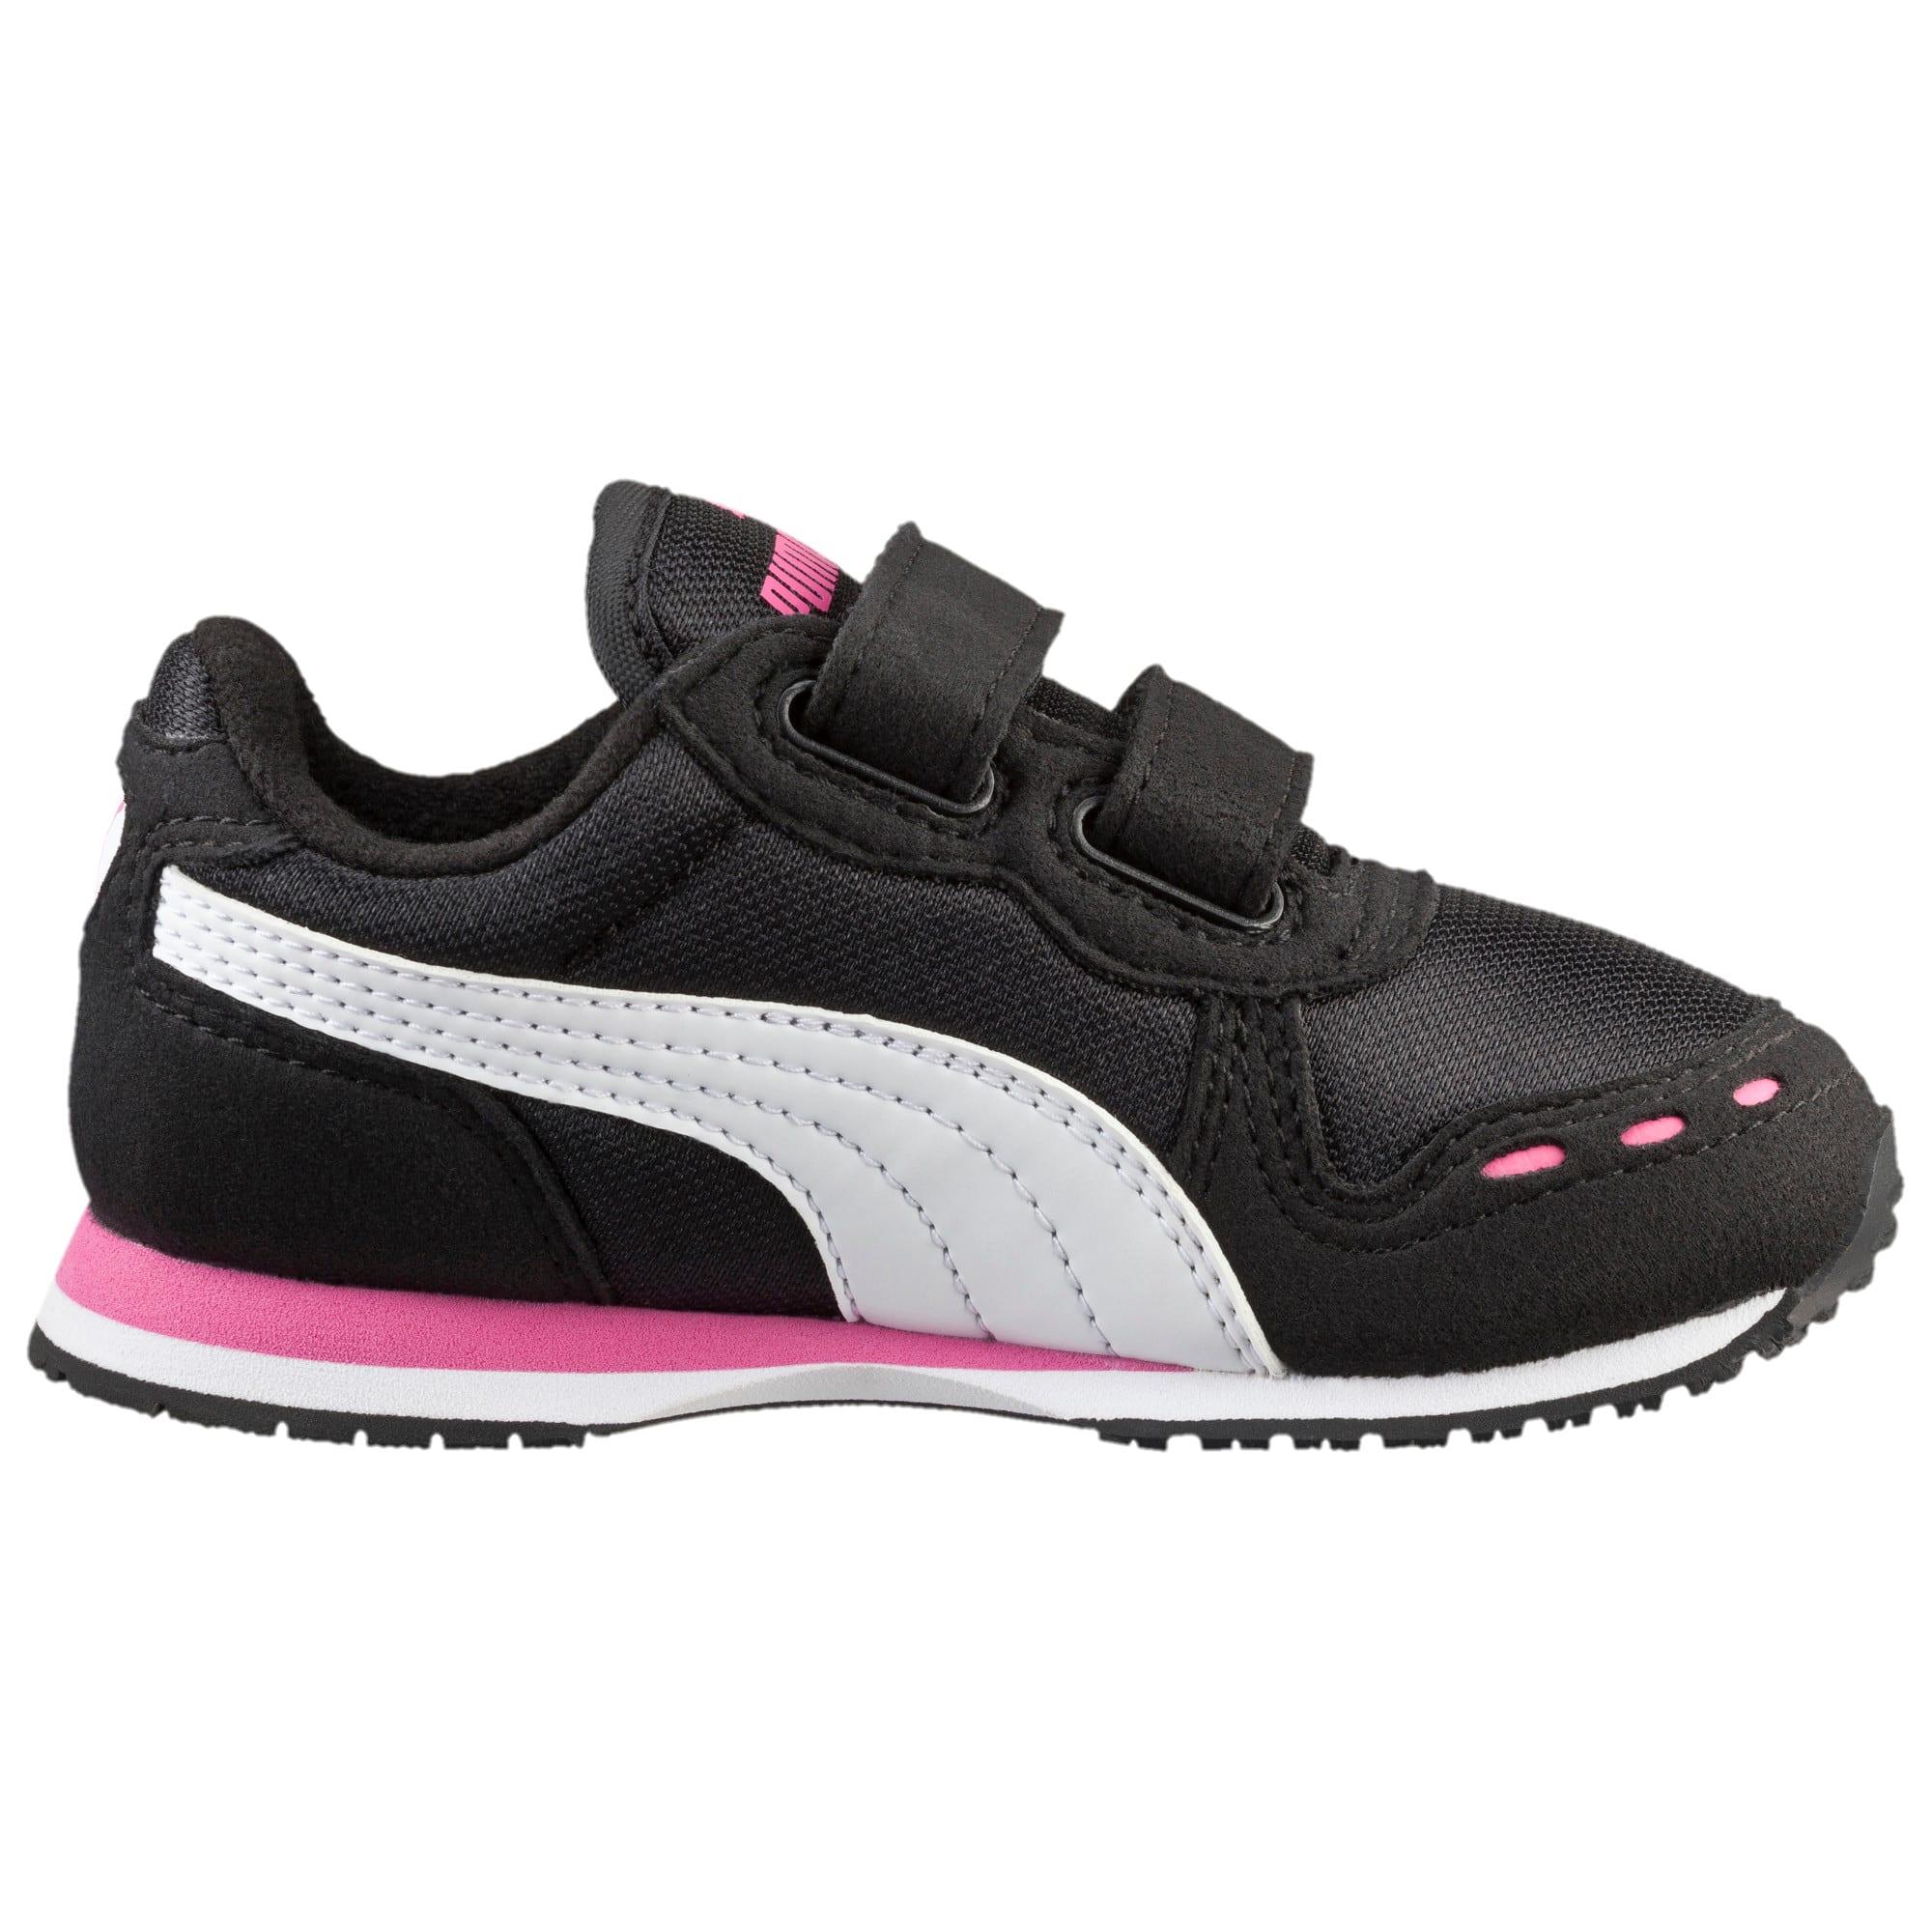 Thumbnail 3 of Cabana Racer Mesh AC Toddler Shoes, black-white-carmine rose, medium